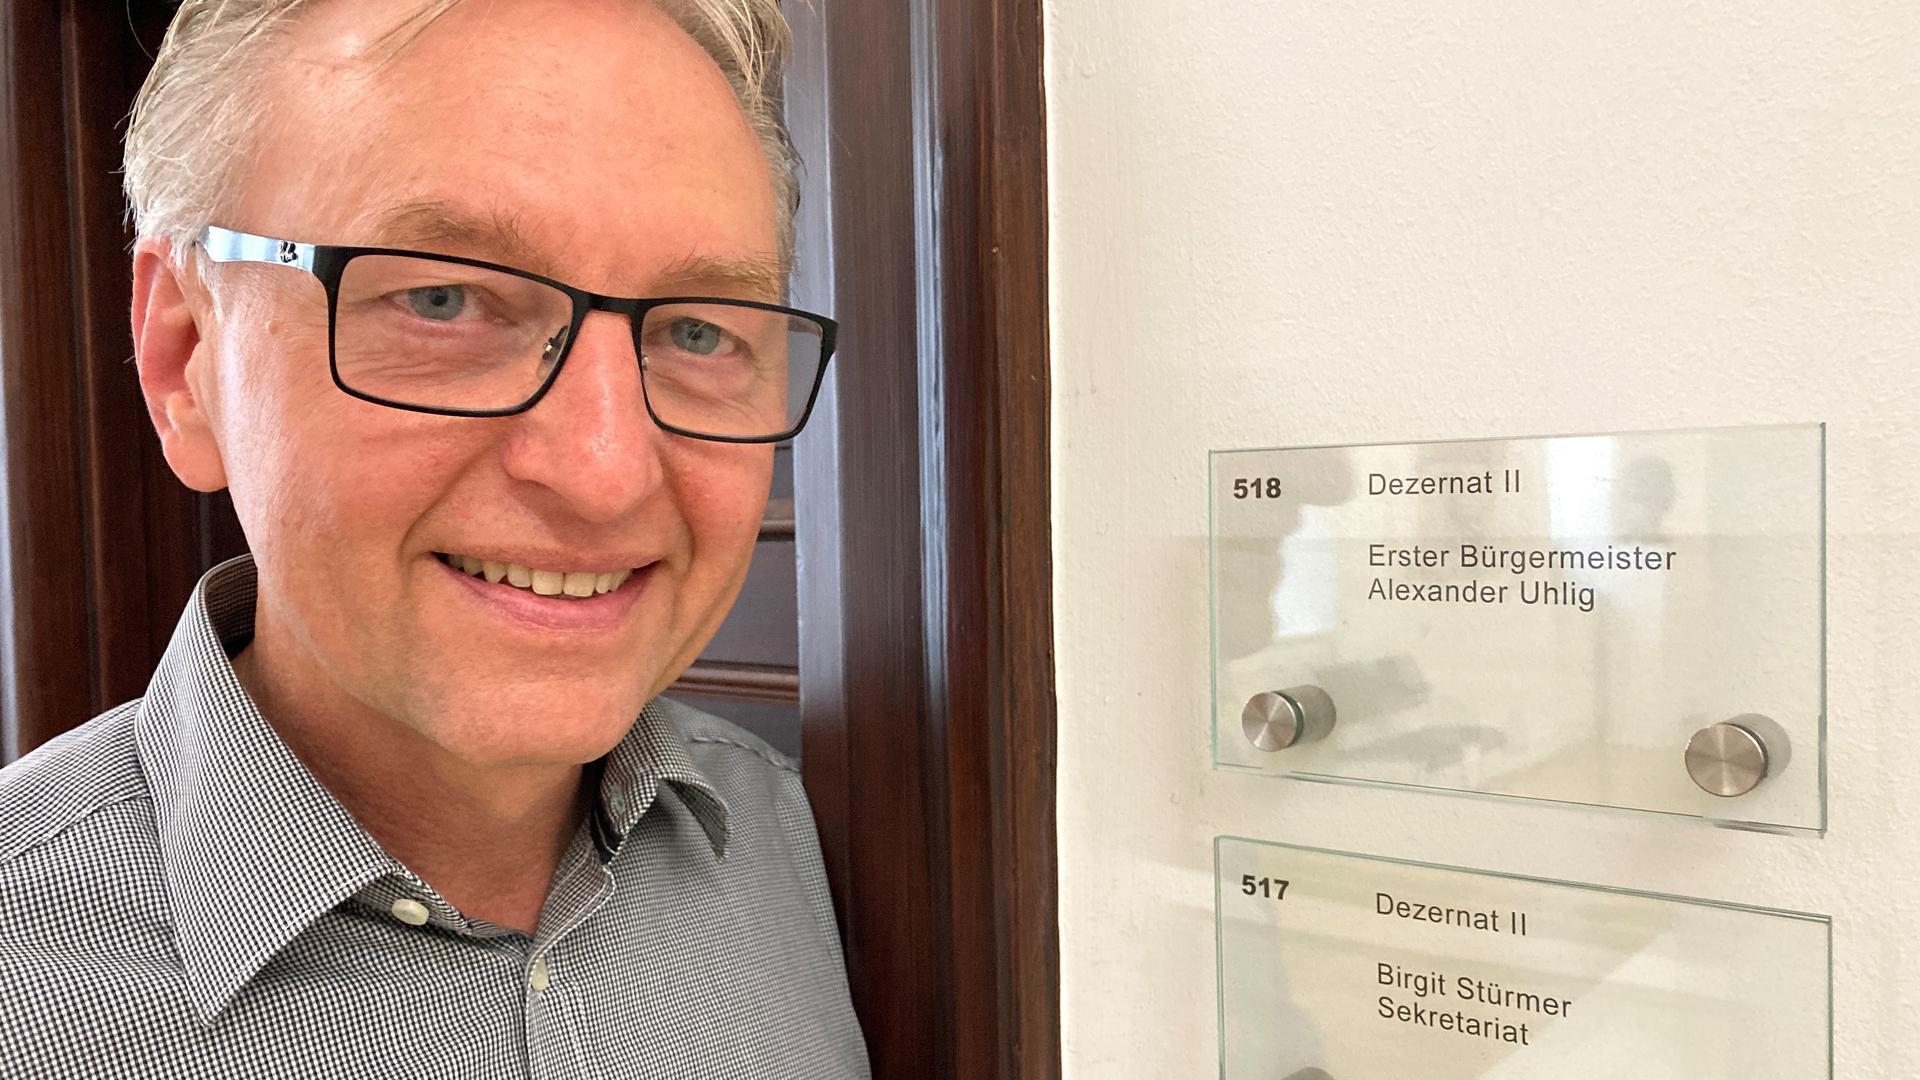 Der Baden-Badener Bau-Bürgermeister Alexander Uhlig steht vor dem Eingang zu seinem Büro.